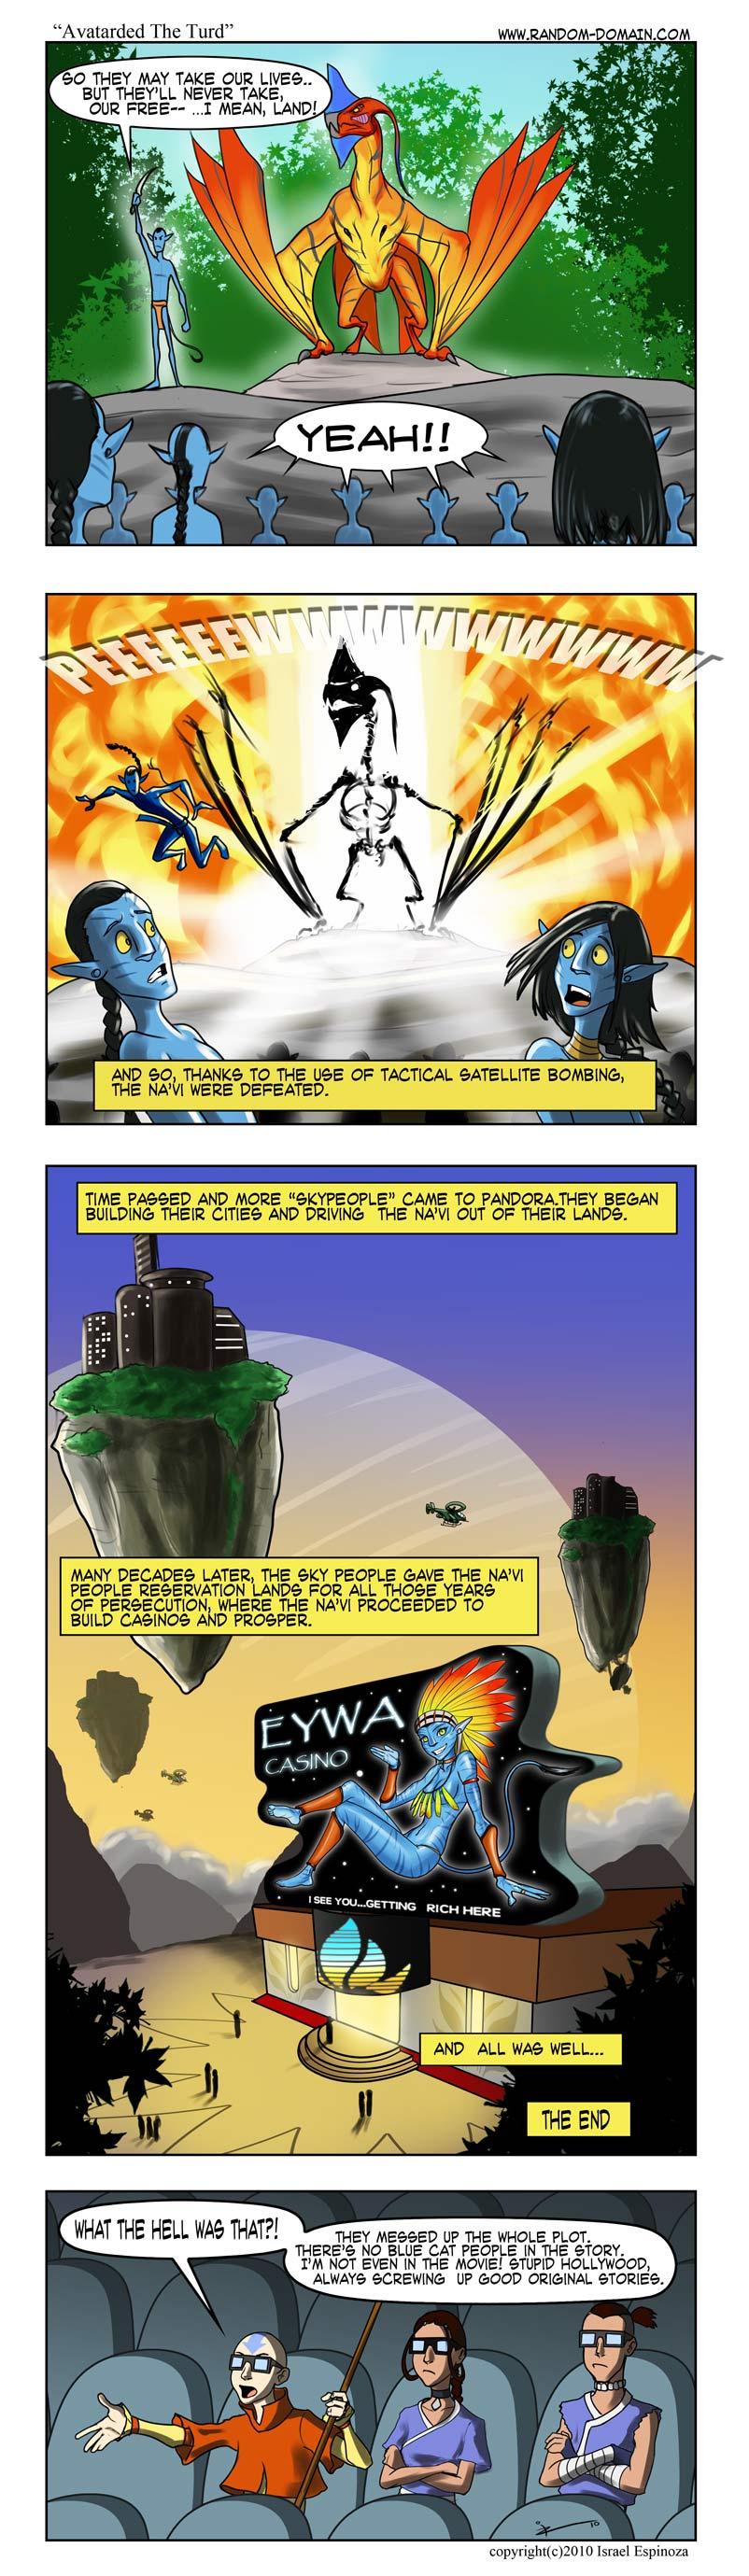 Avatarded The Turd by IZRA from Random-Domain! When Avatar